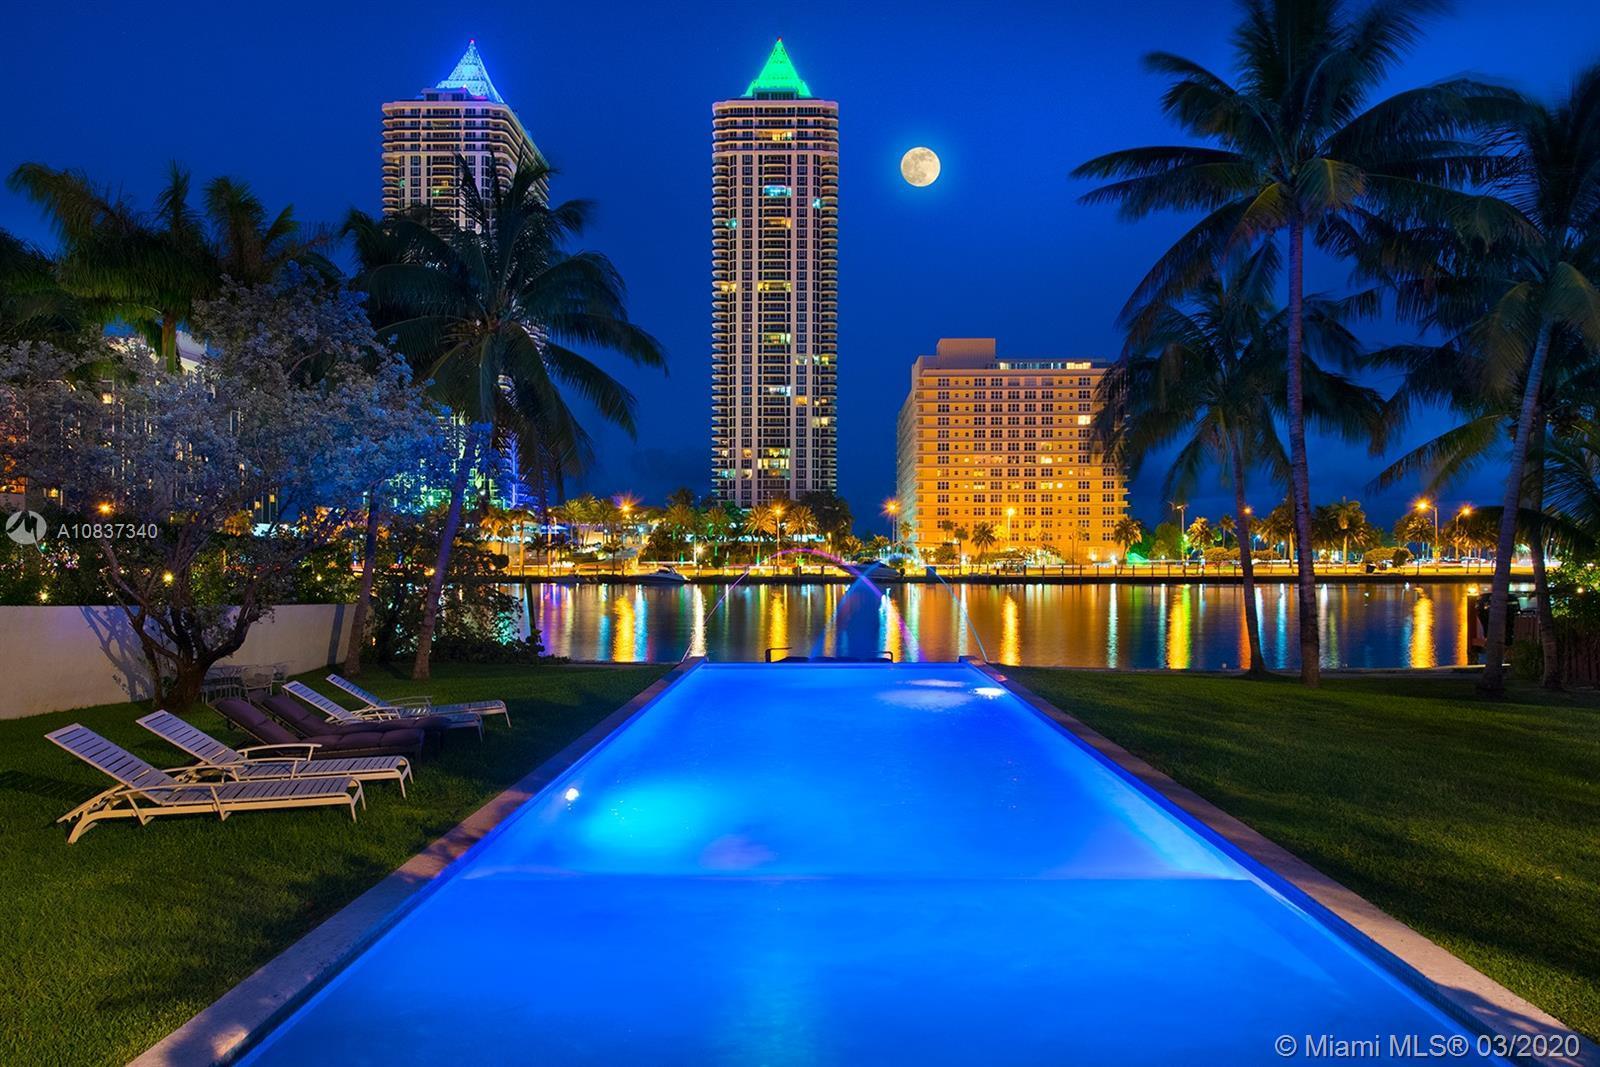 4745 Pine Tree Dr, Miami Beach, FL, 33140